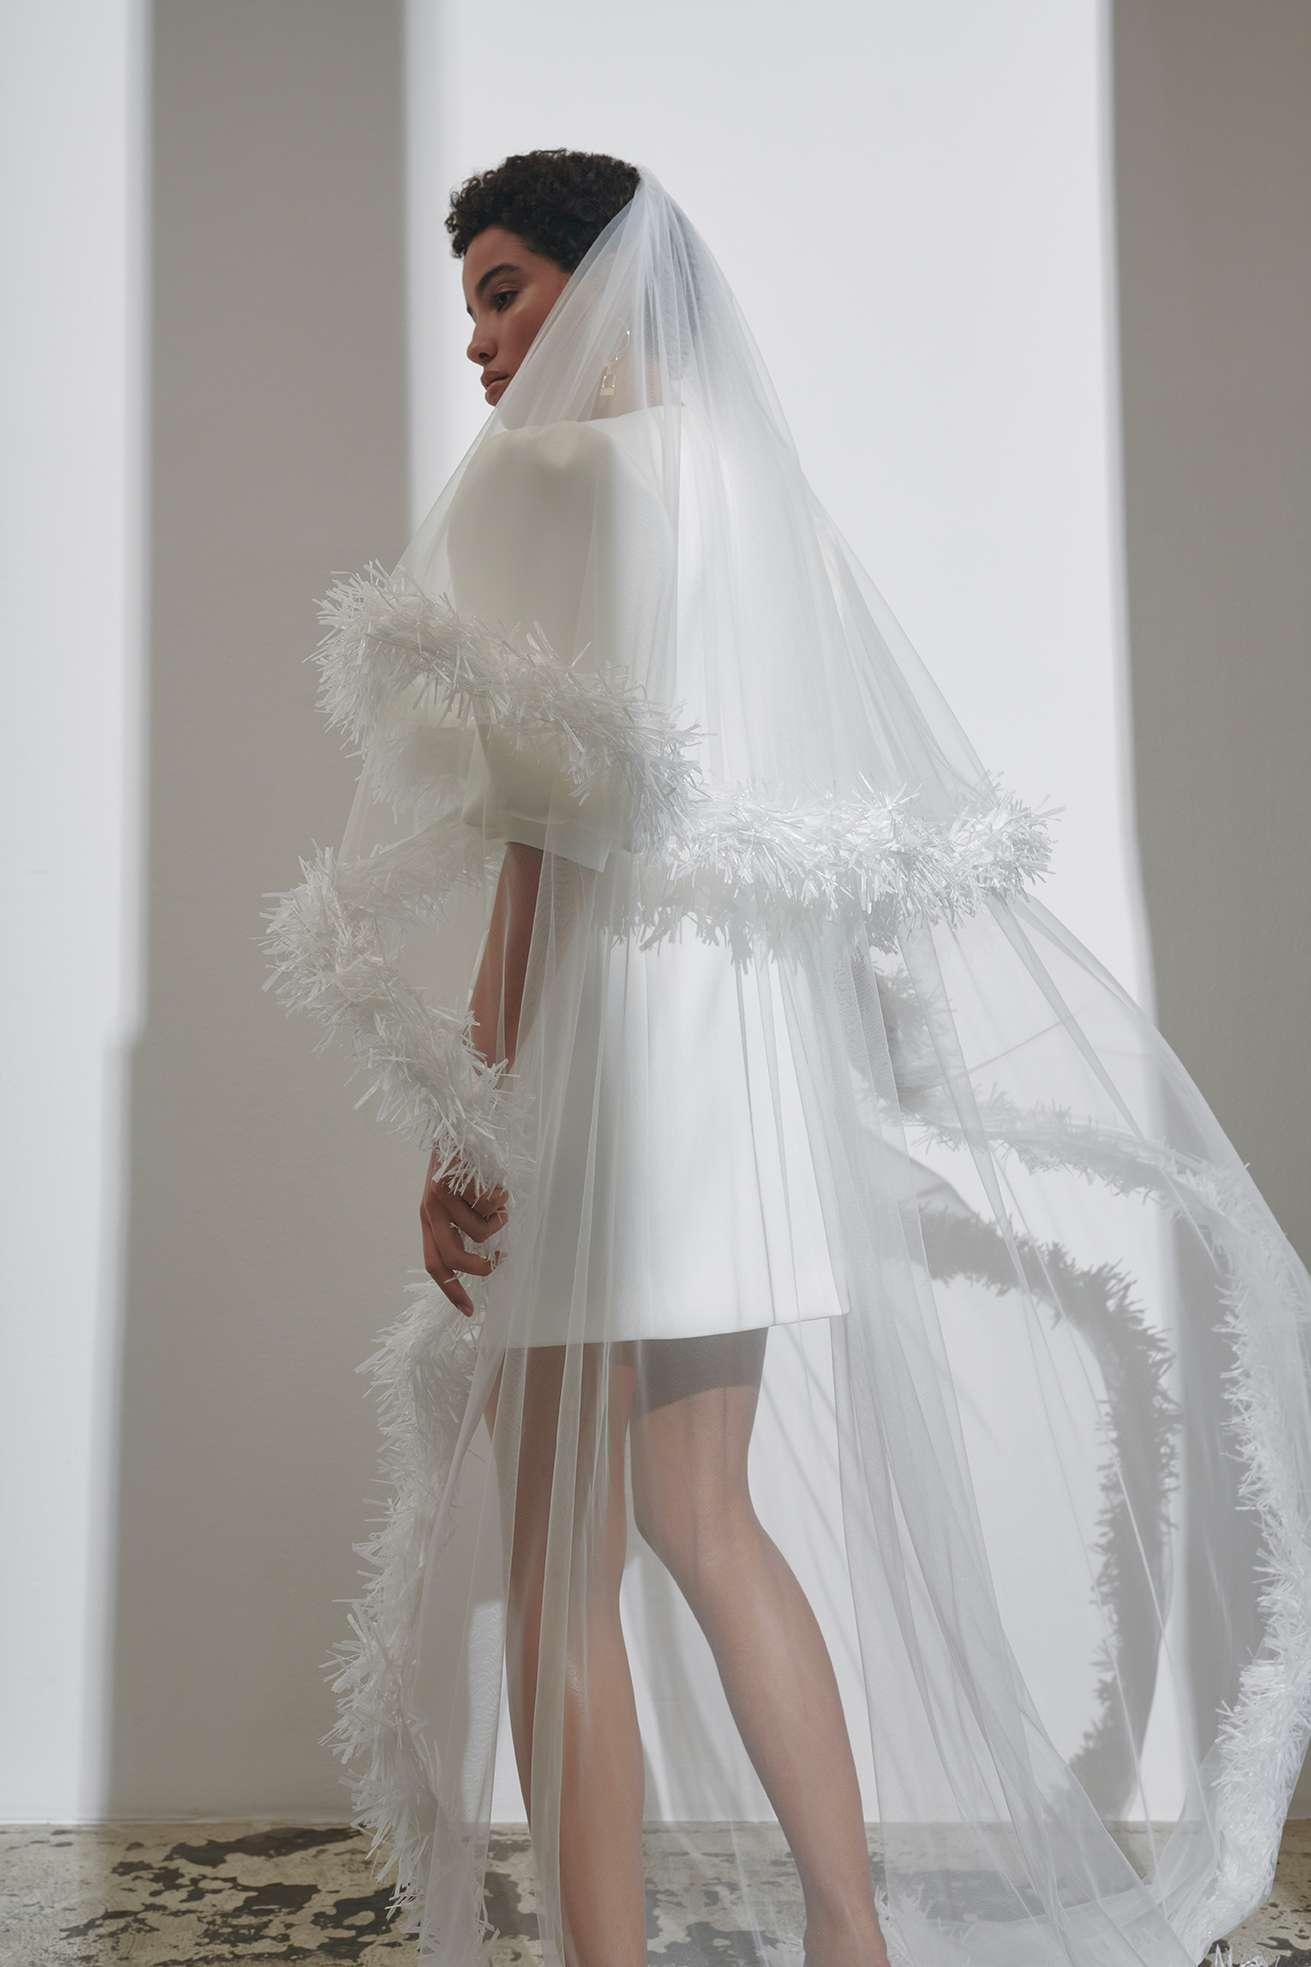 puffy dress with thorn veil kaviar gauche